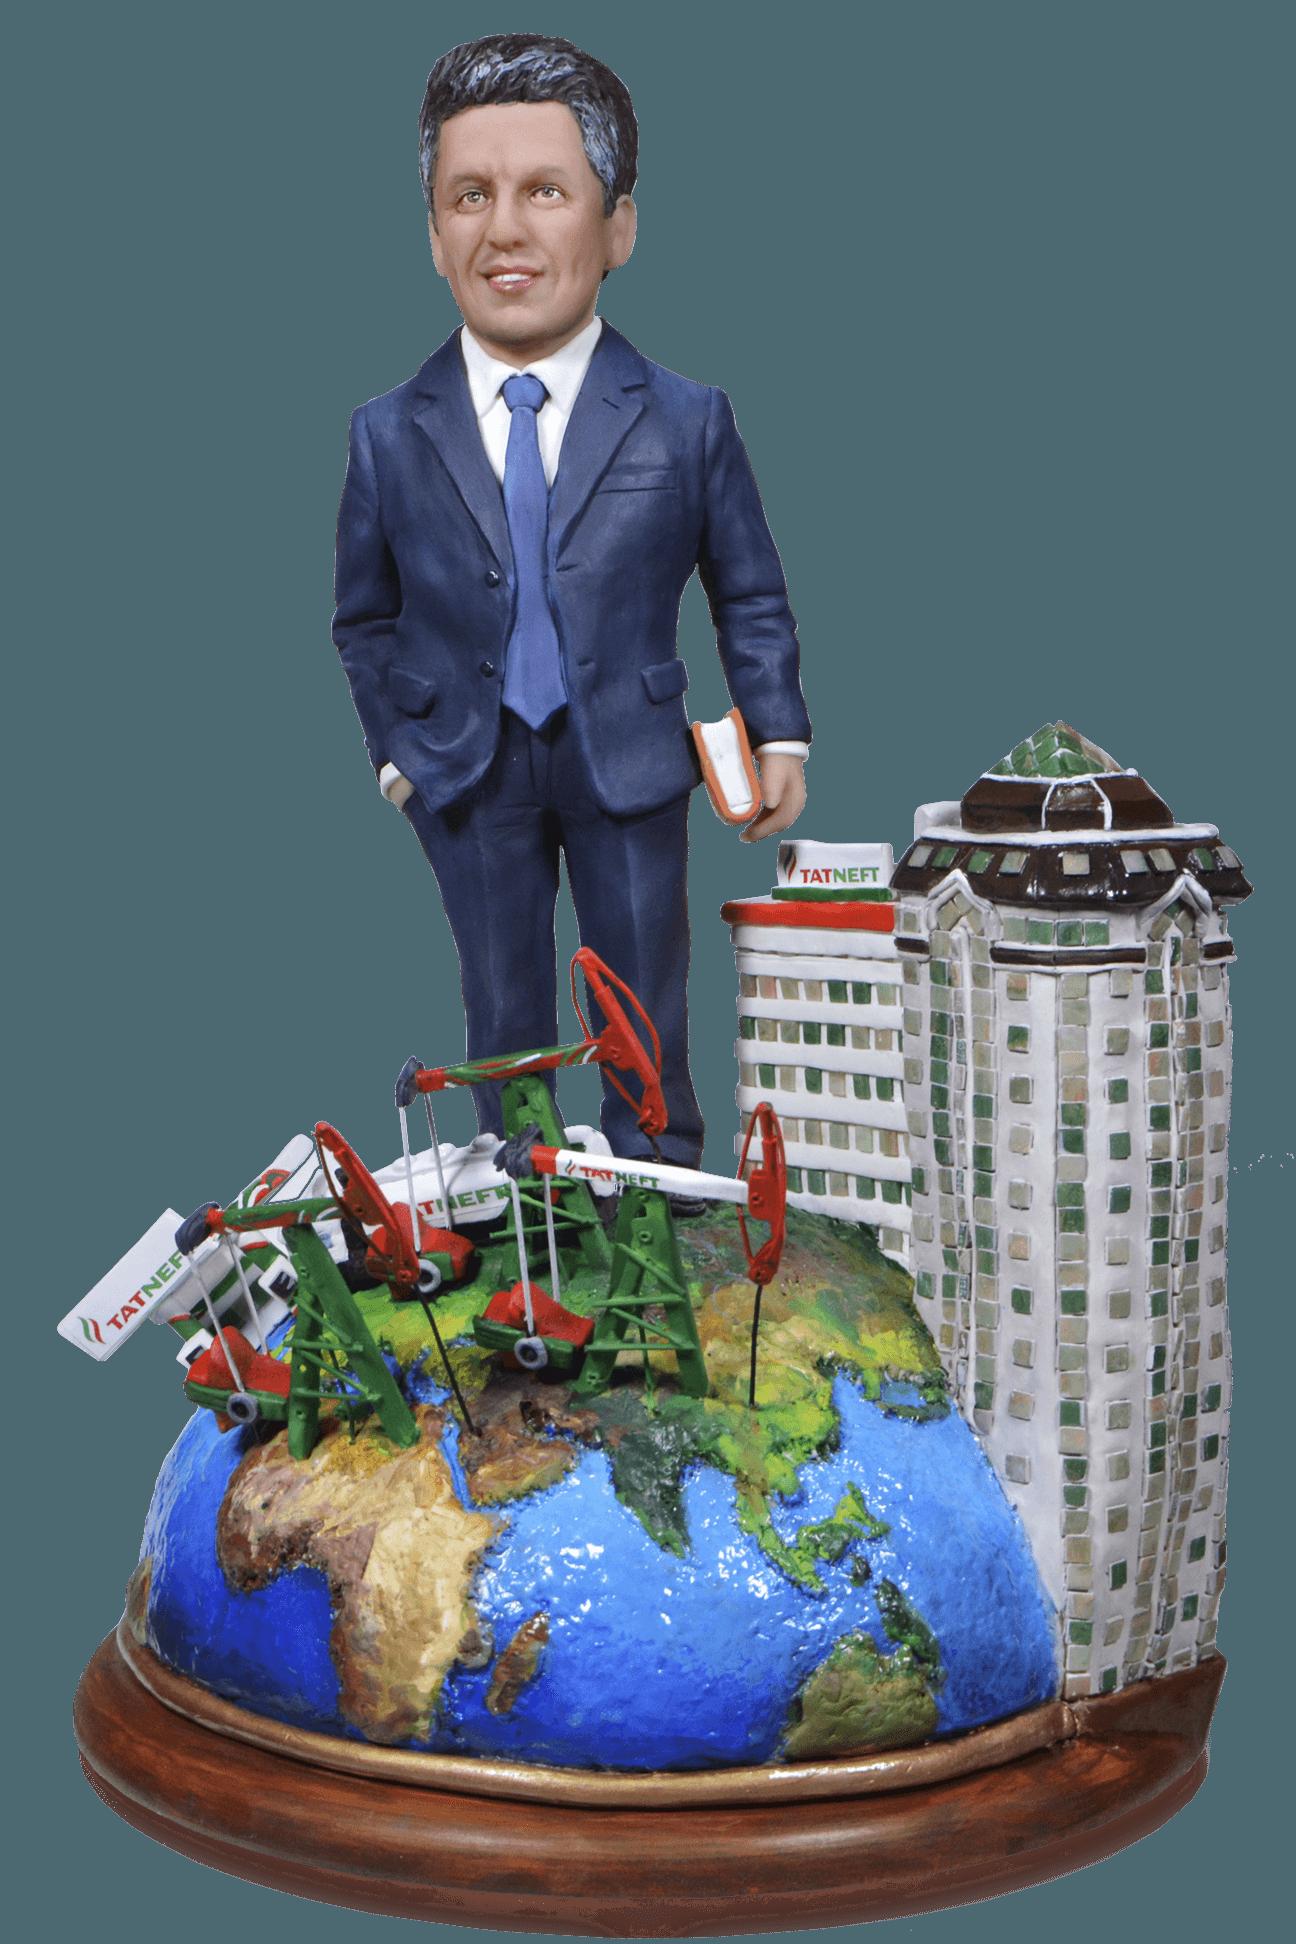 Vip подарок нефтянику по фото Президенту корпорации 35 см